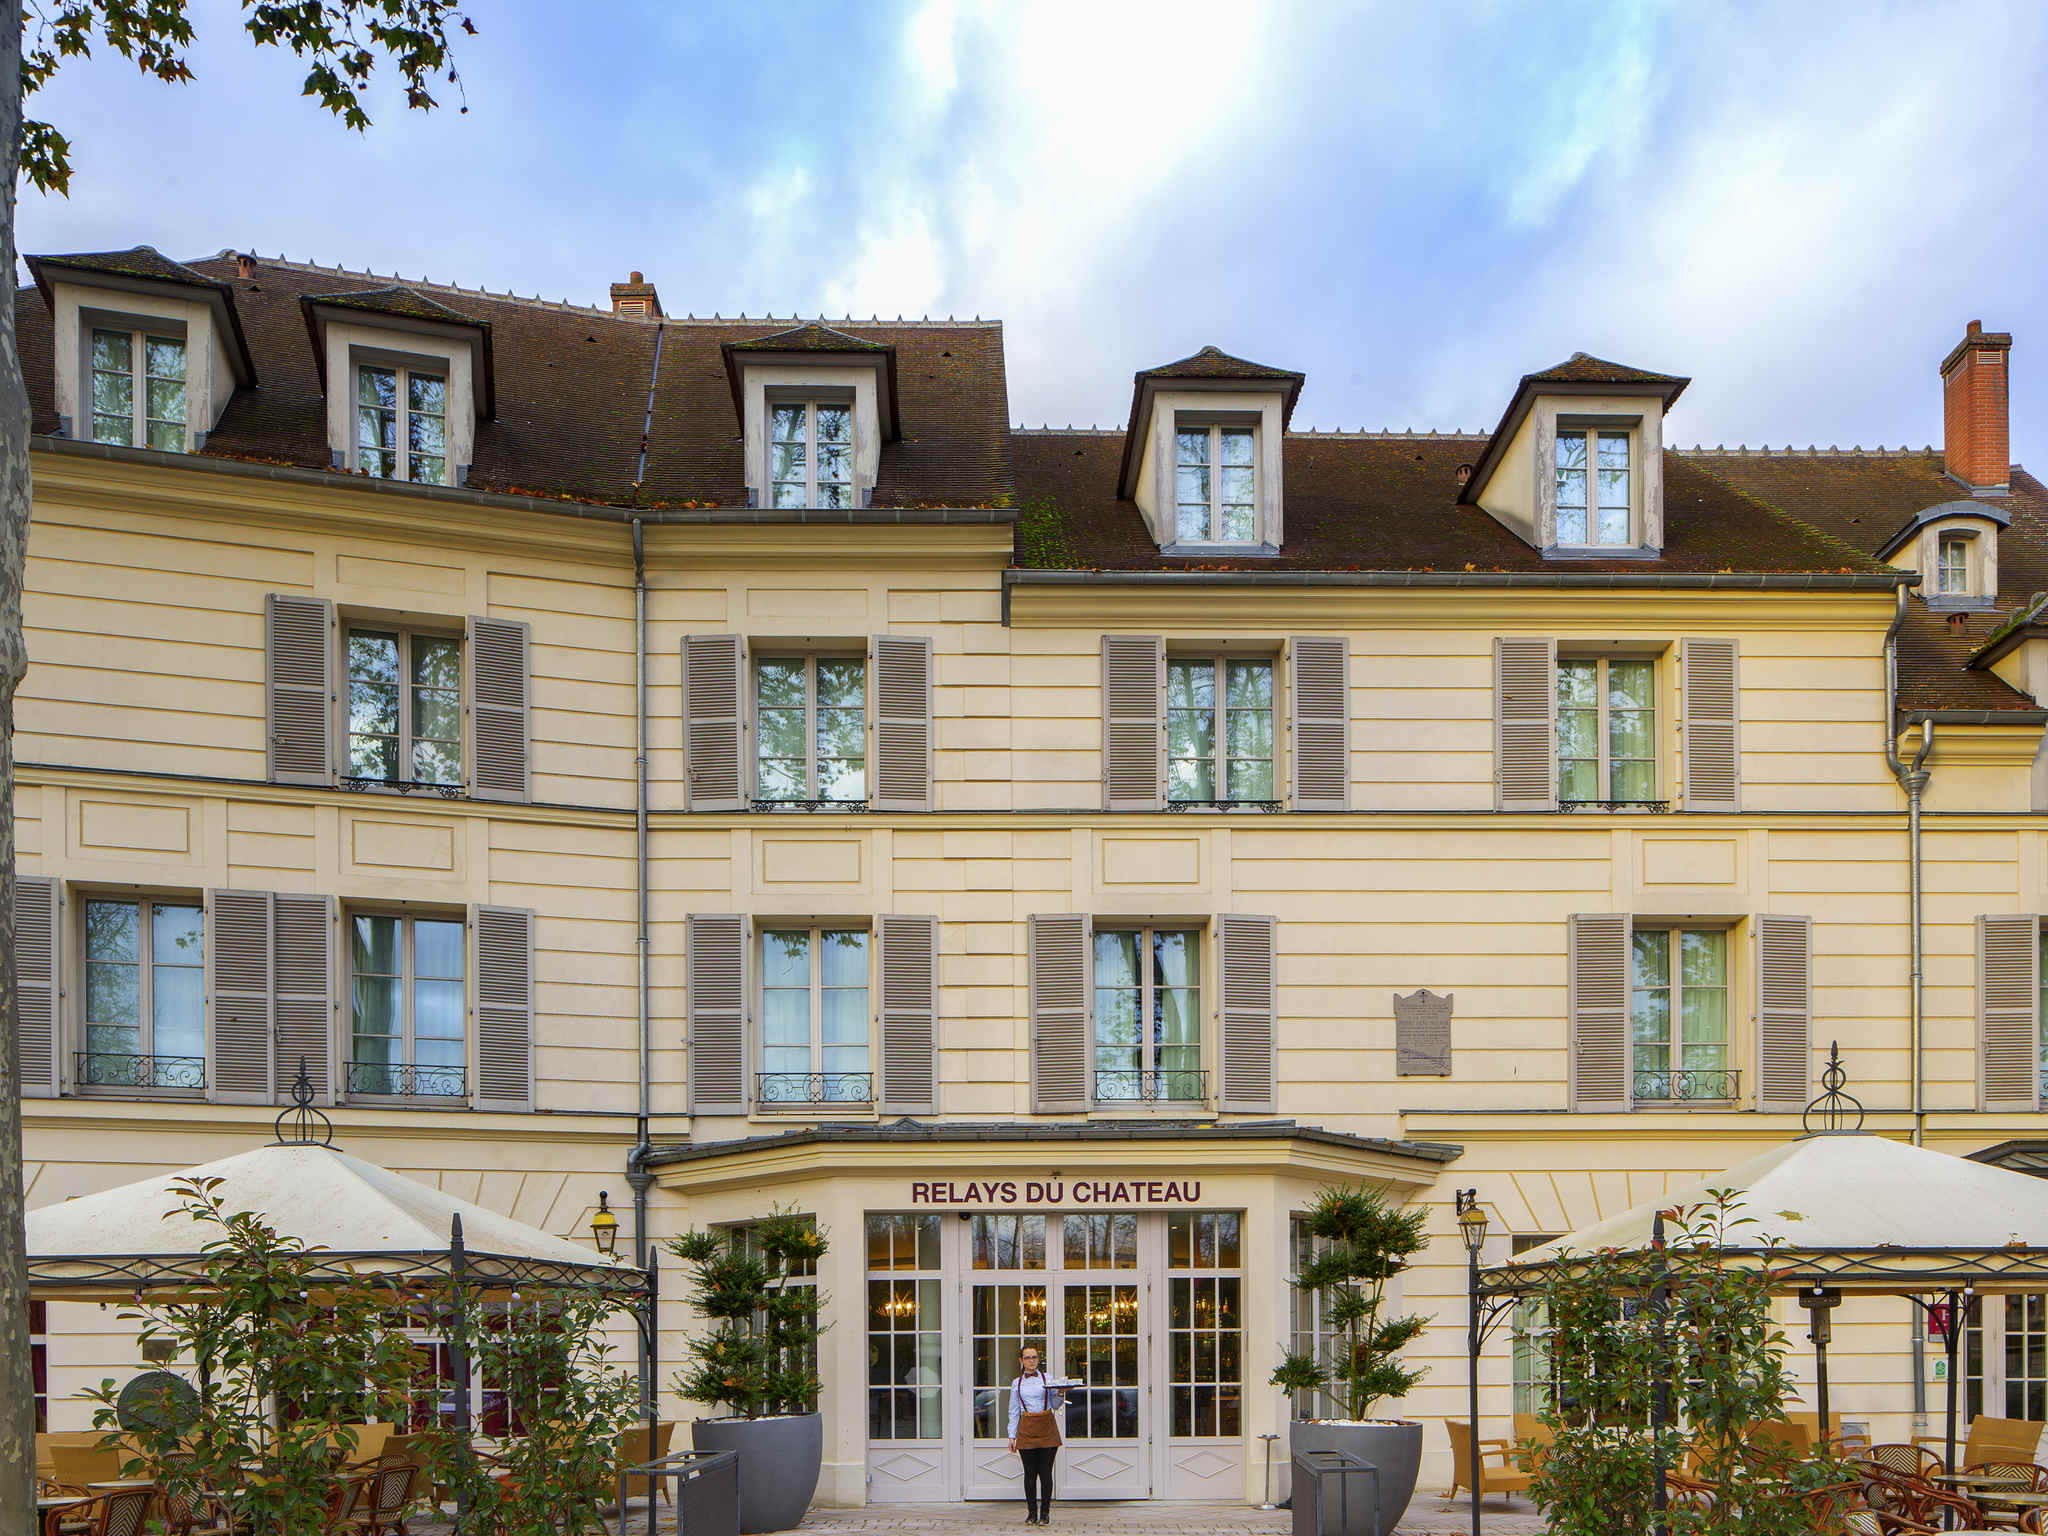 Hotel - Mercure Rambouillet Relays du Château Hotel